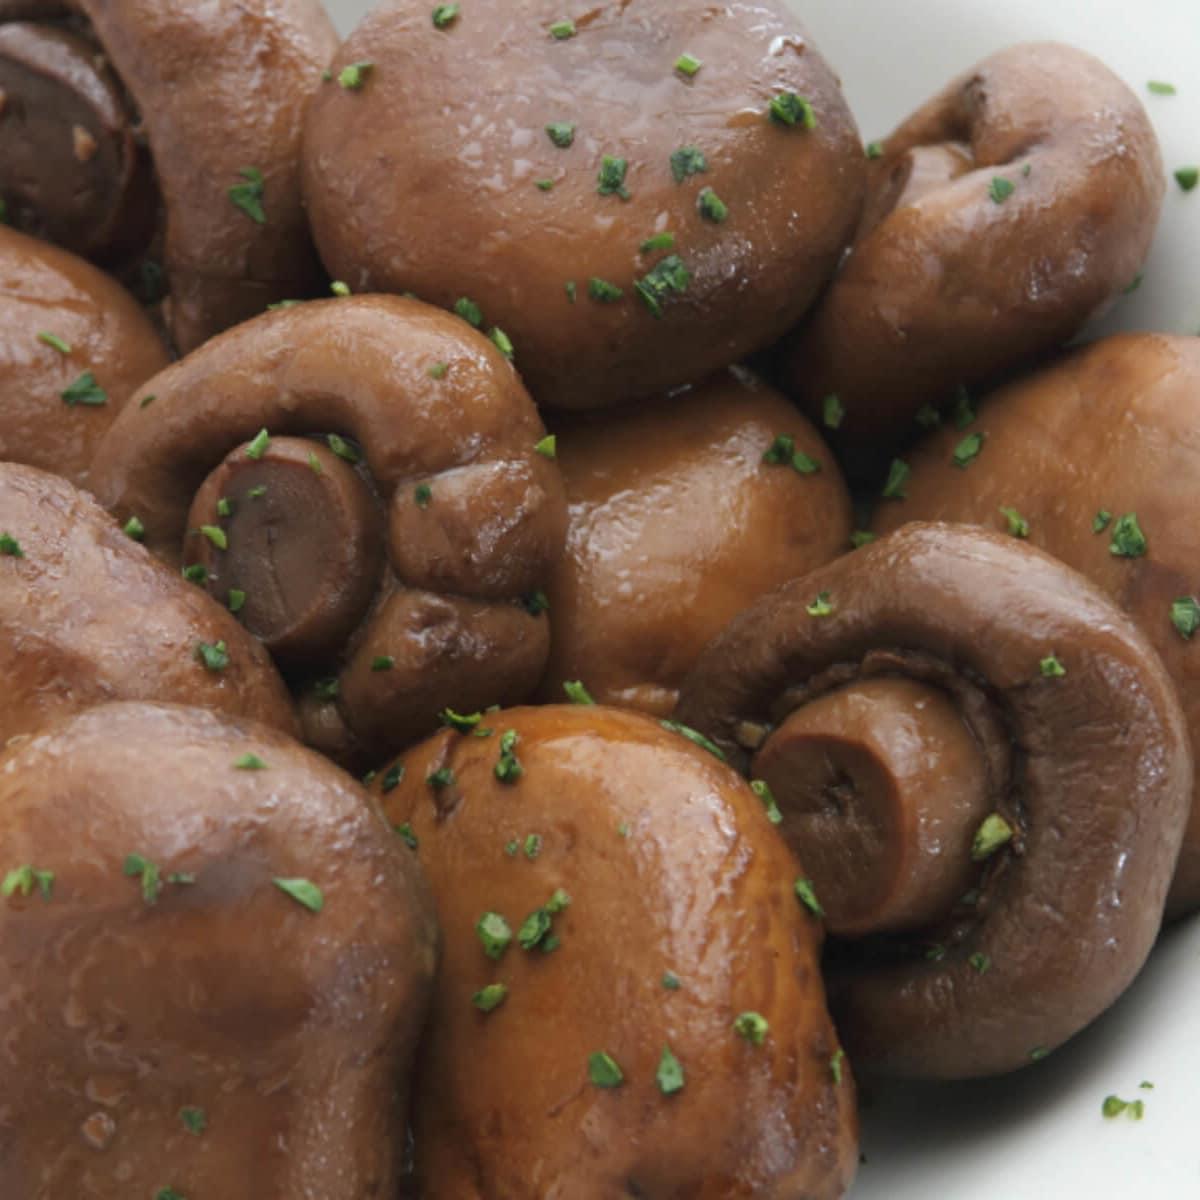 Bob's Steak mushrooms